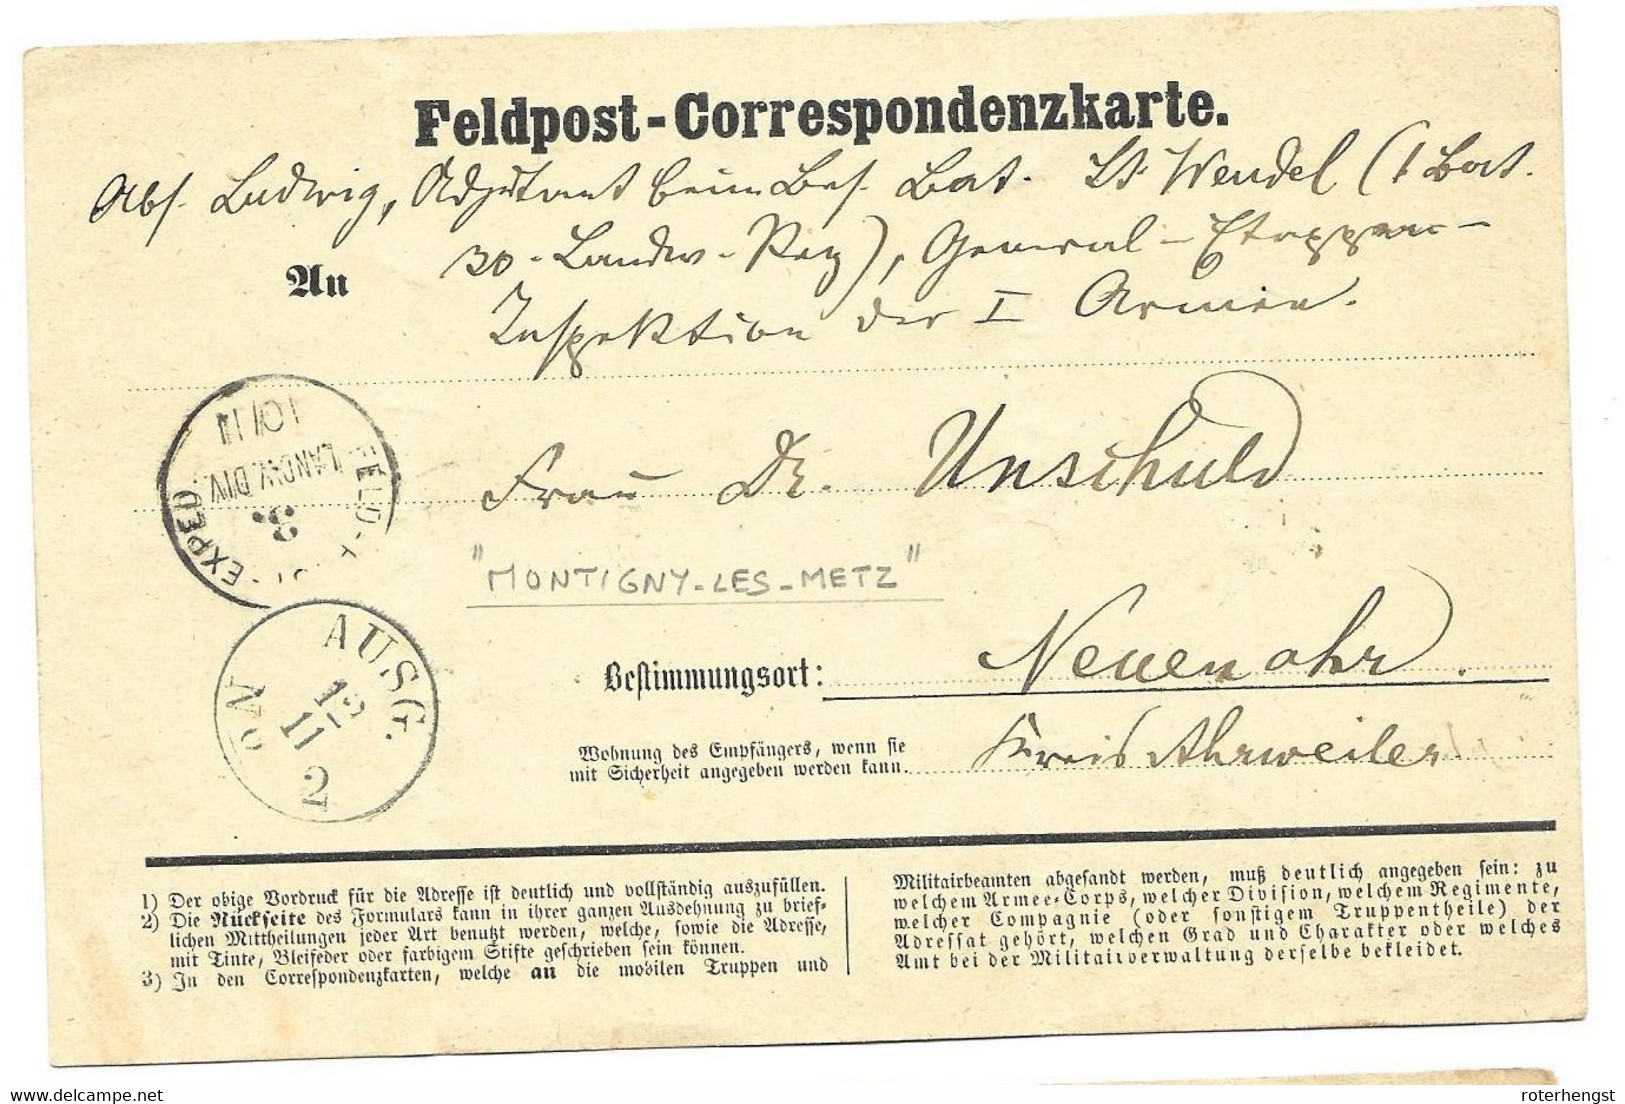 1871 Feldpost Card From A German Soldier In Montigny-les-Metz - Wars